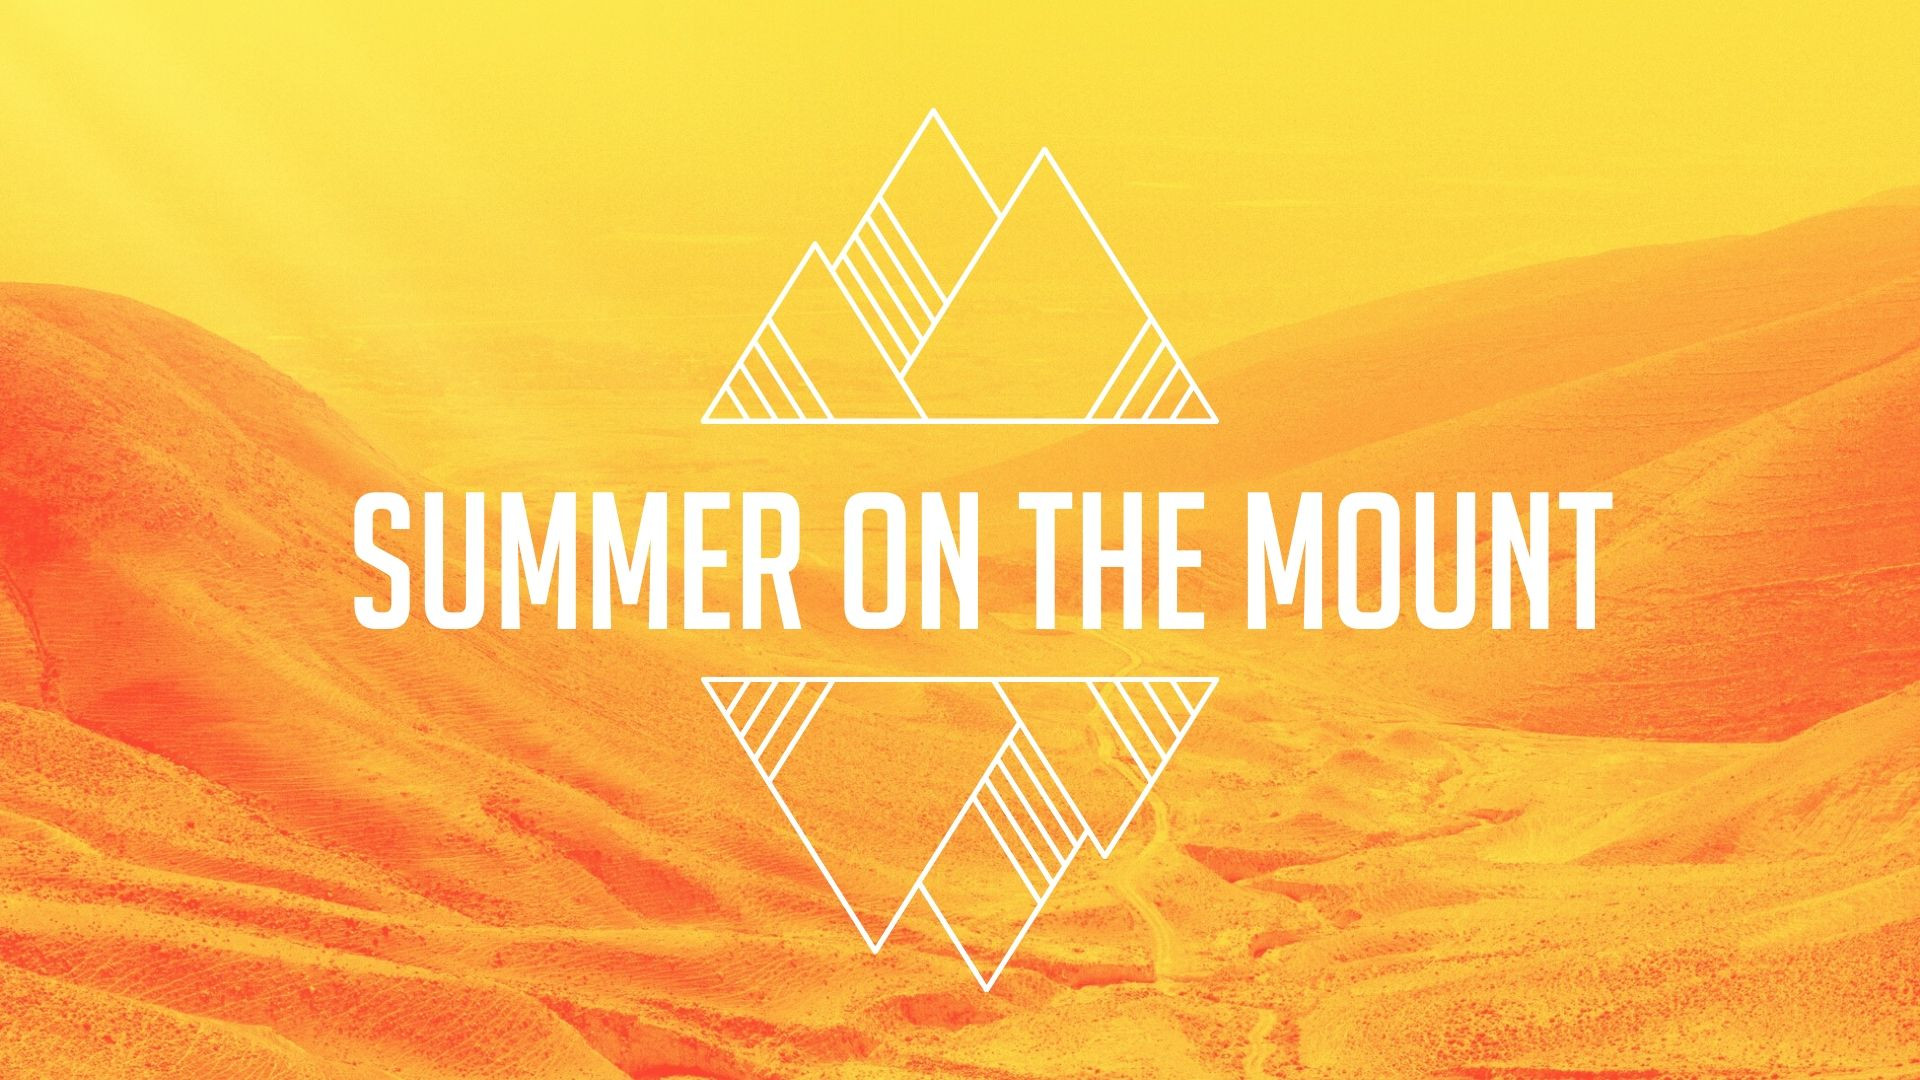 SUMMER ON THE MOUNT